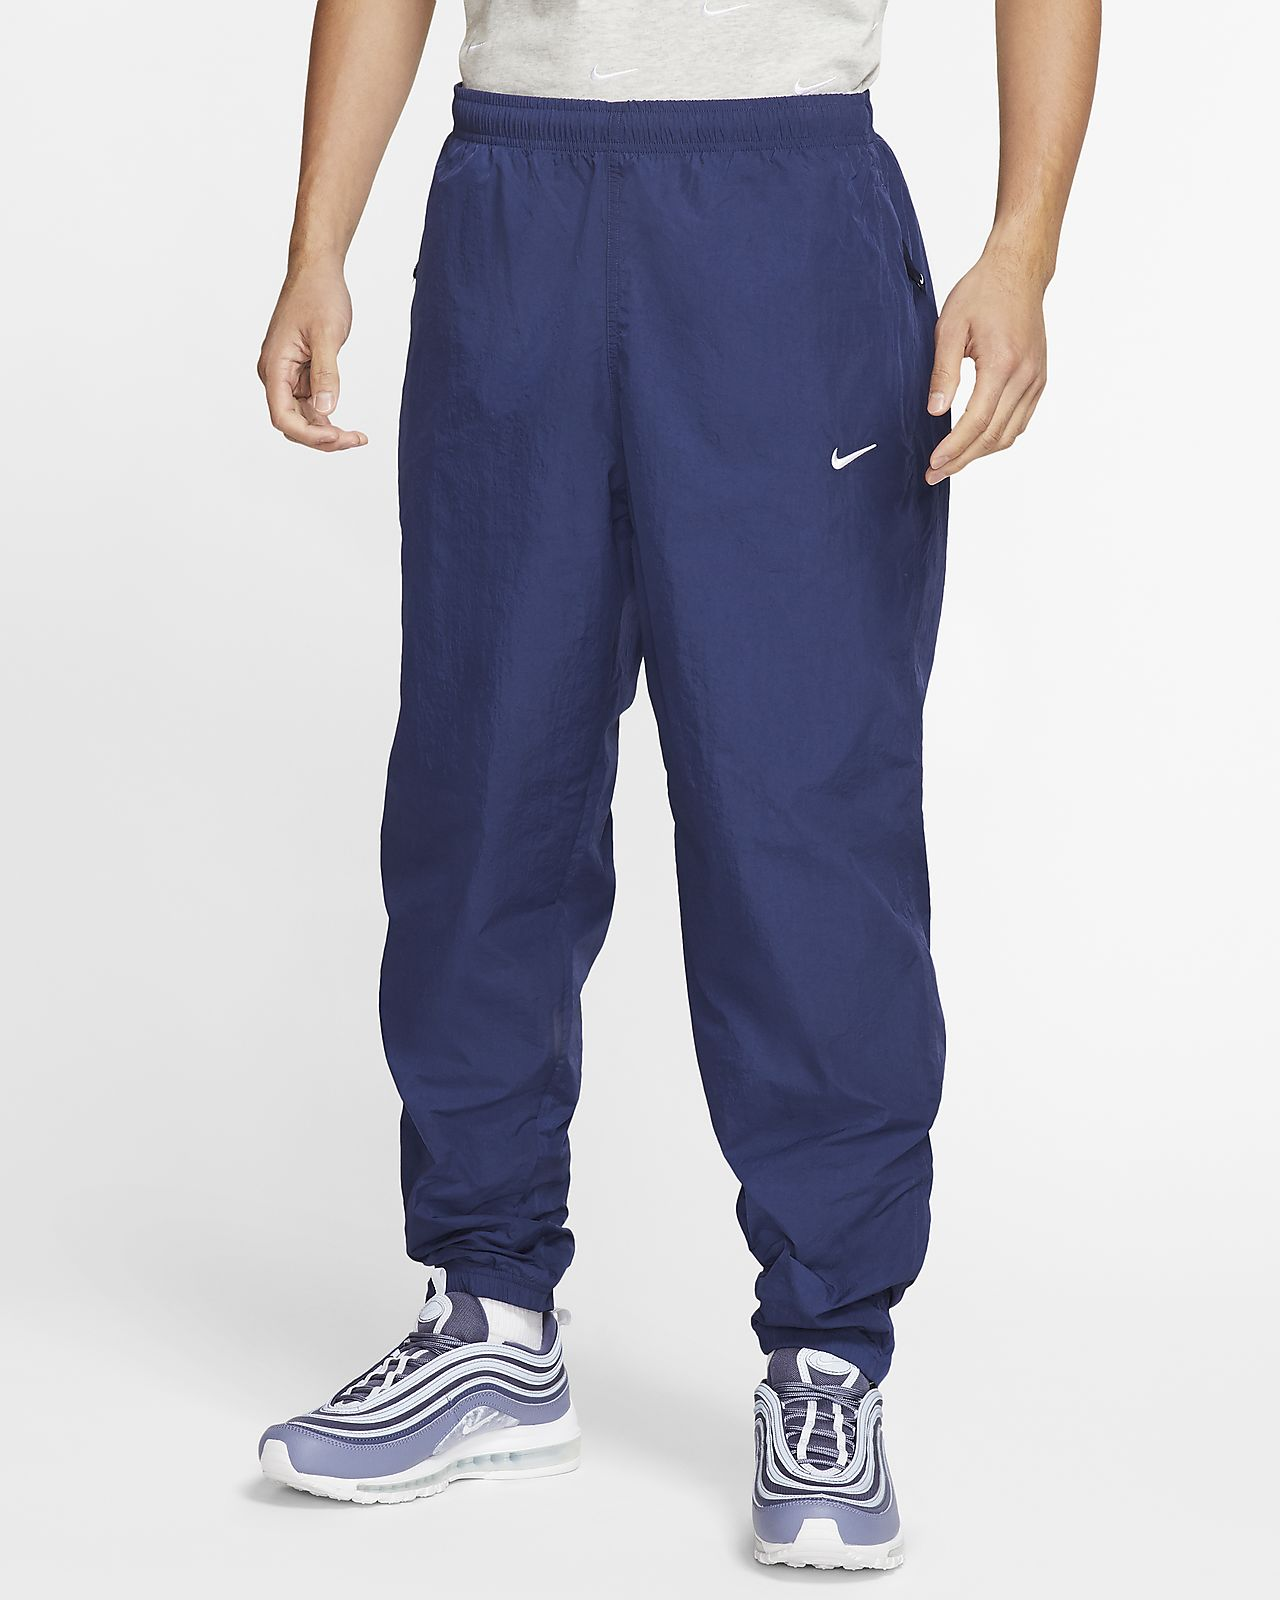 Nike Herren-Trackhose